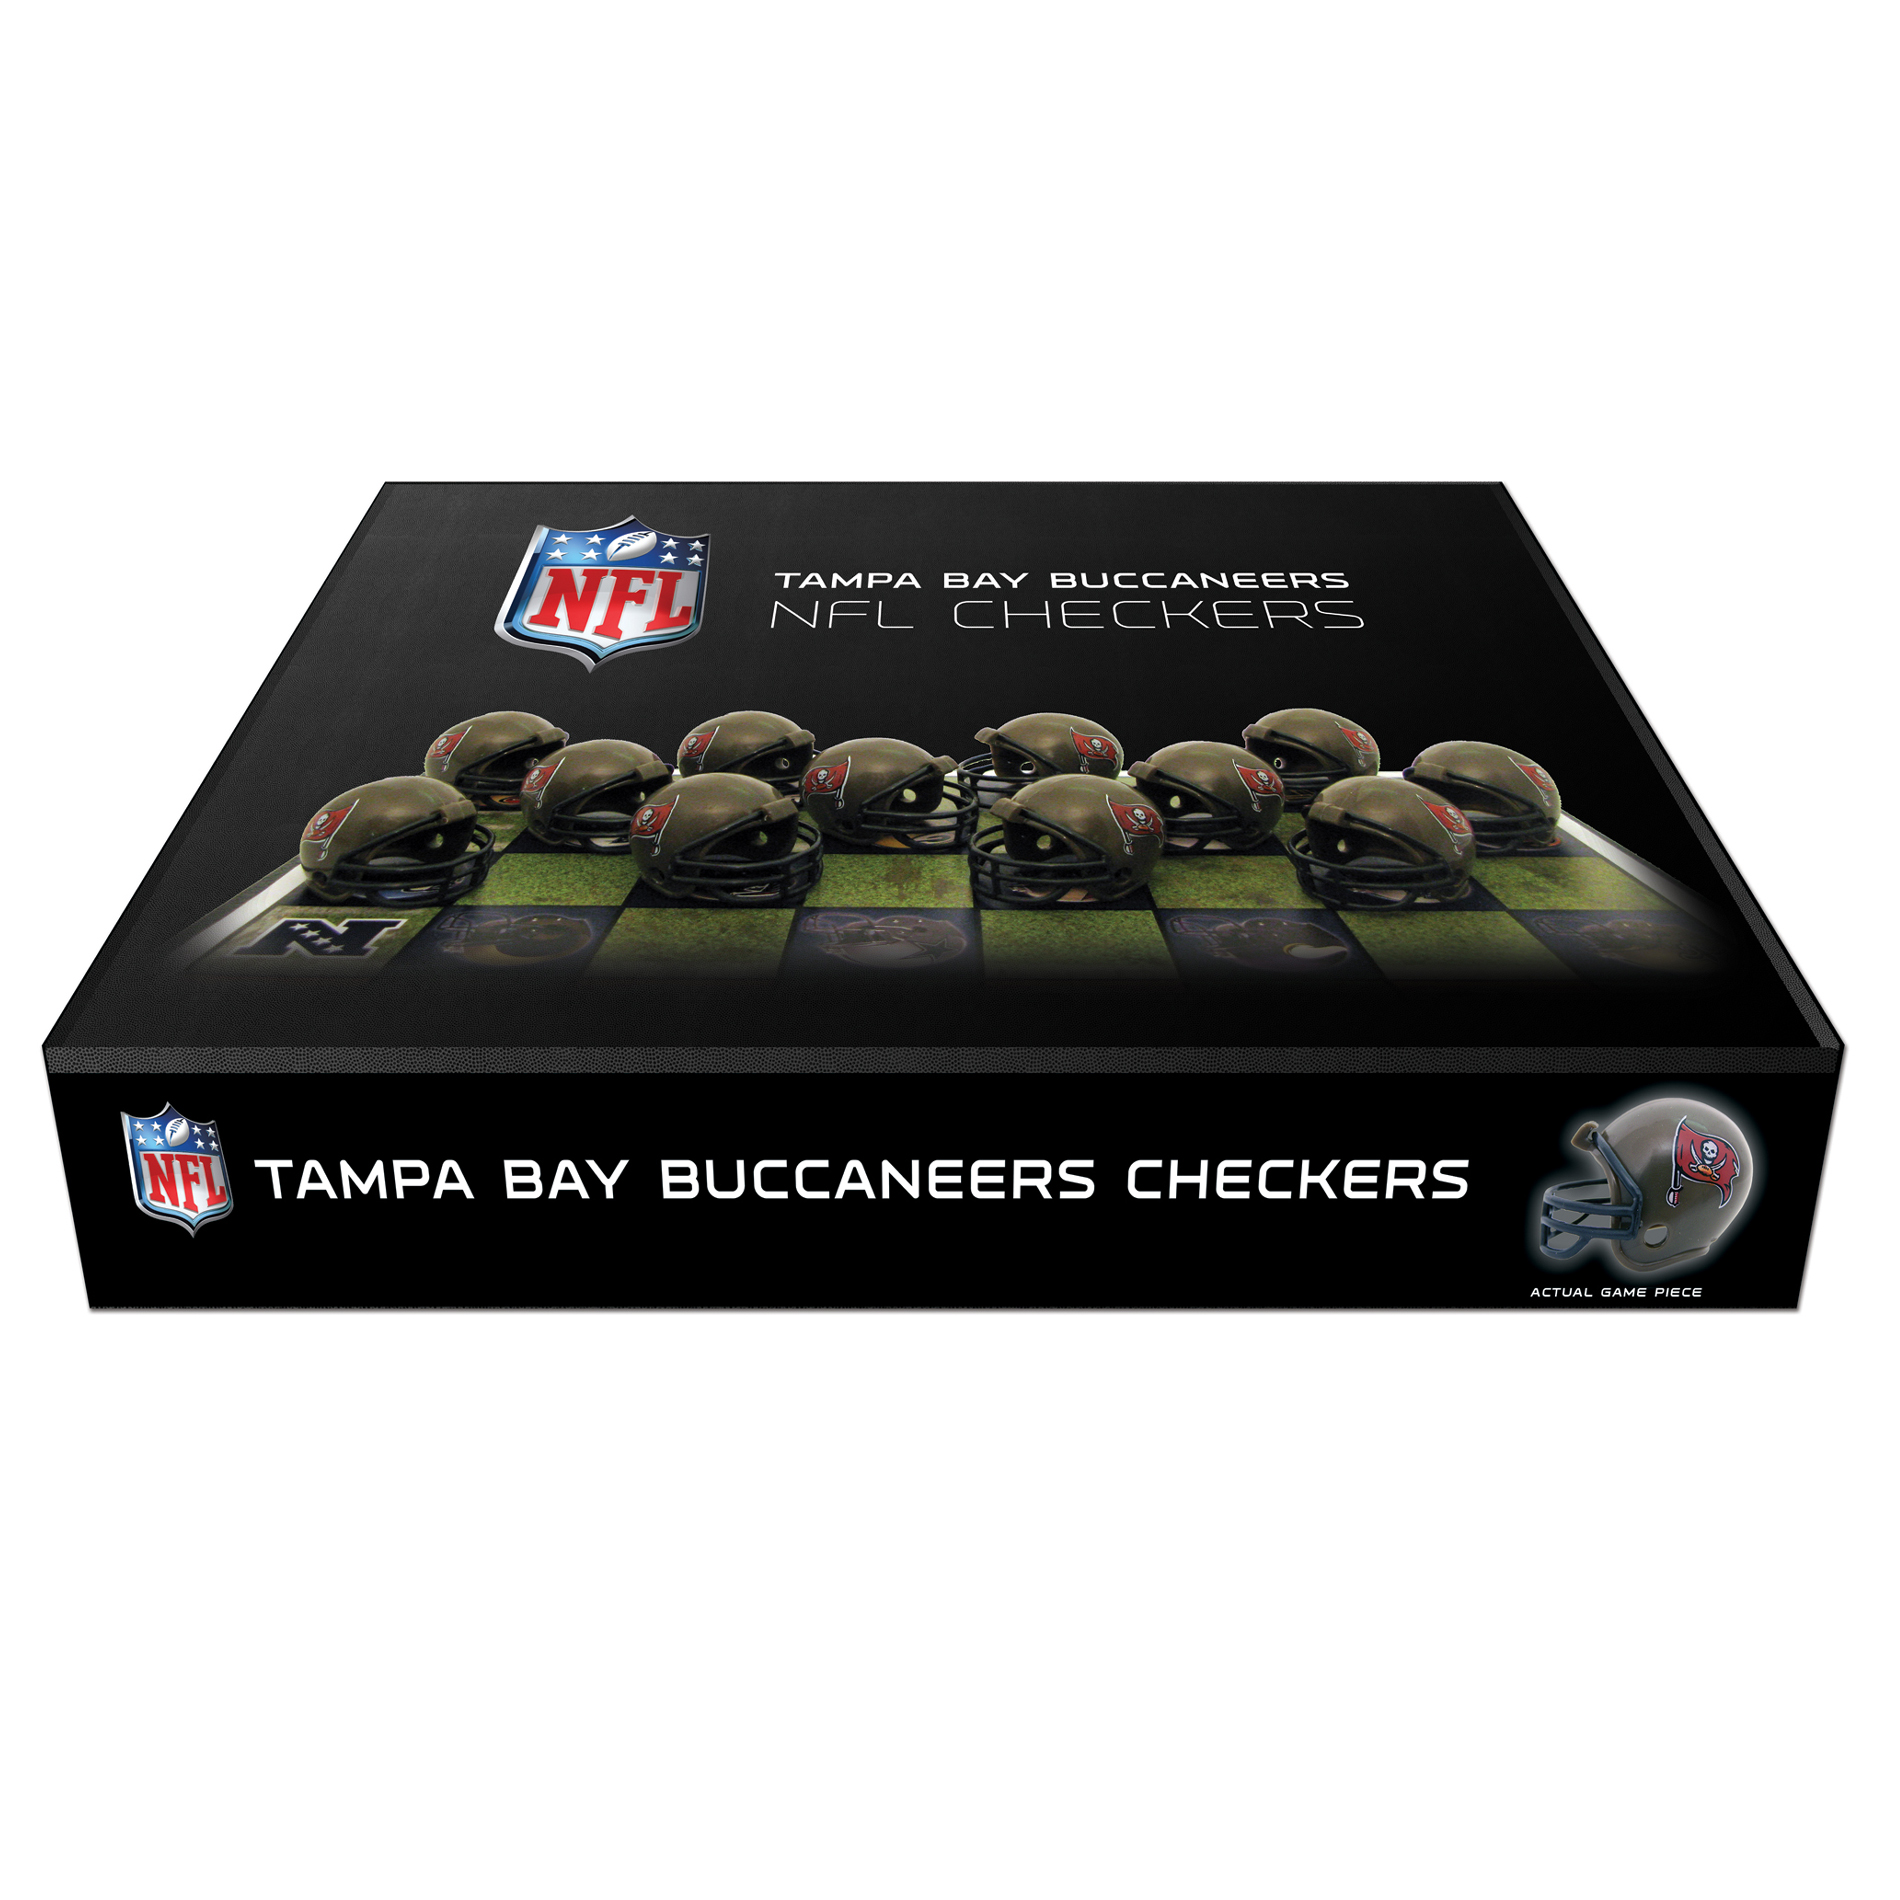 Tampa Bay Buccaneers - Rico Checker Set